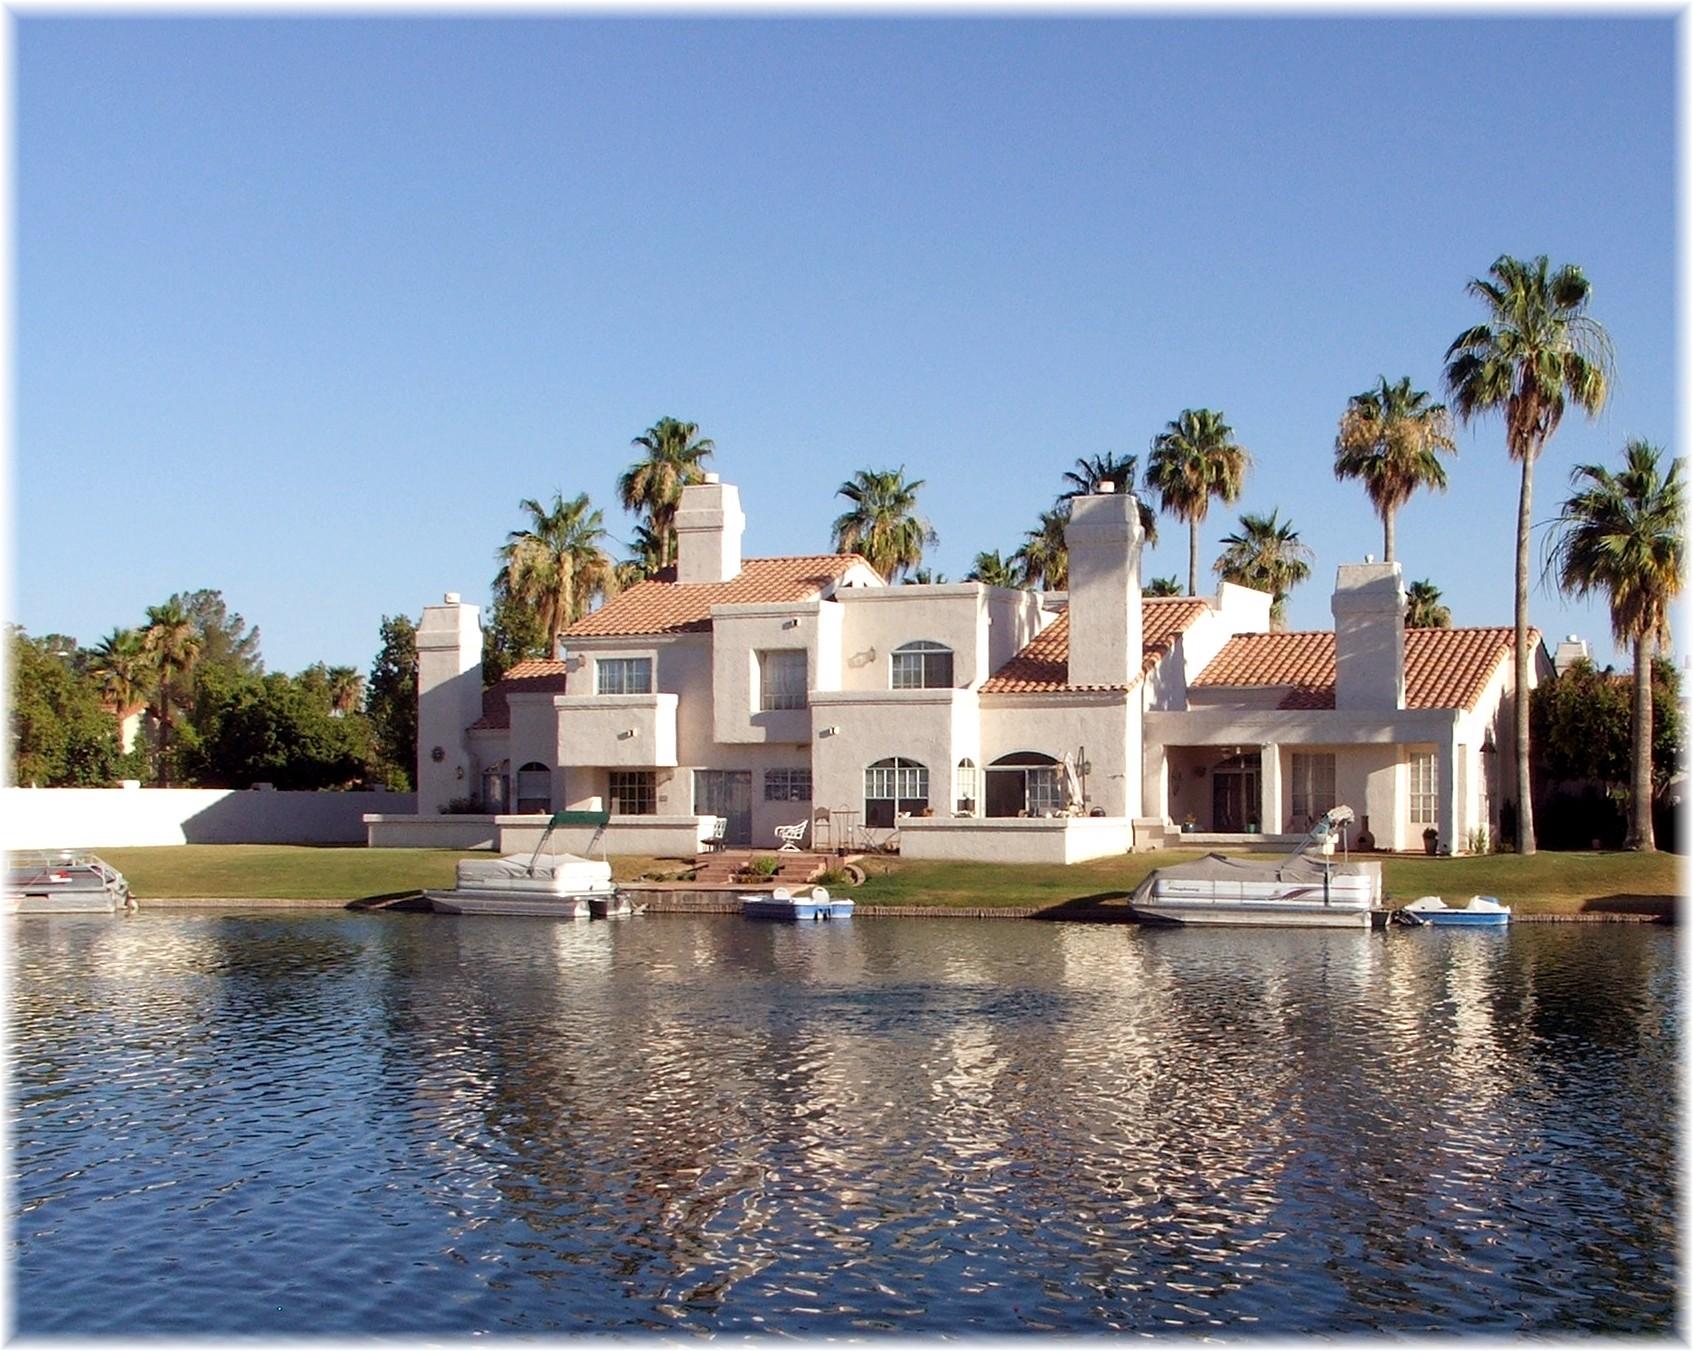 Phoenix Arizona Waterfront Homes» Boating in Phoenix Lake Communities